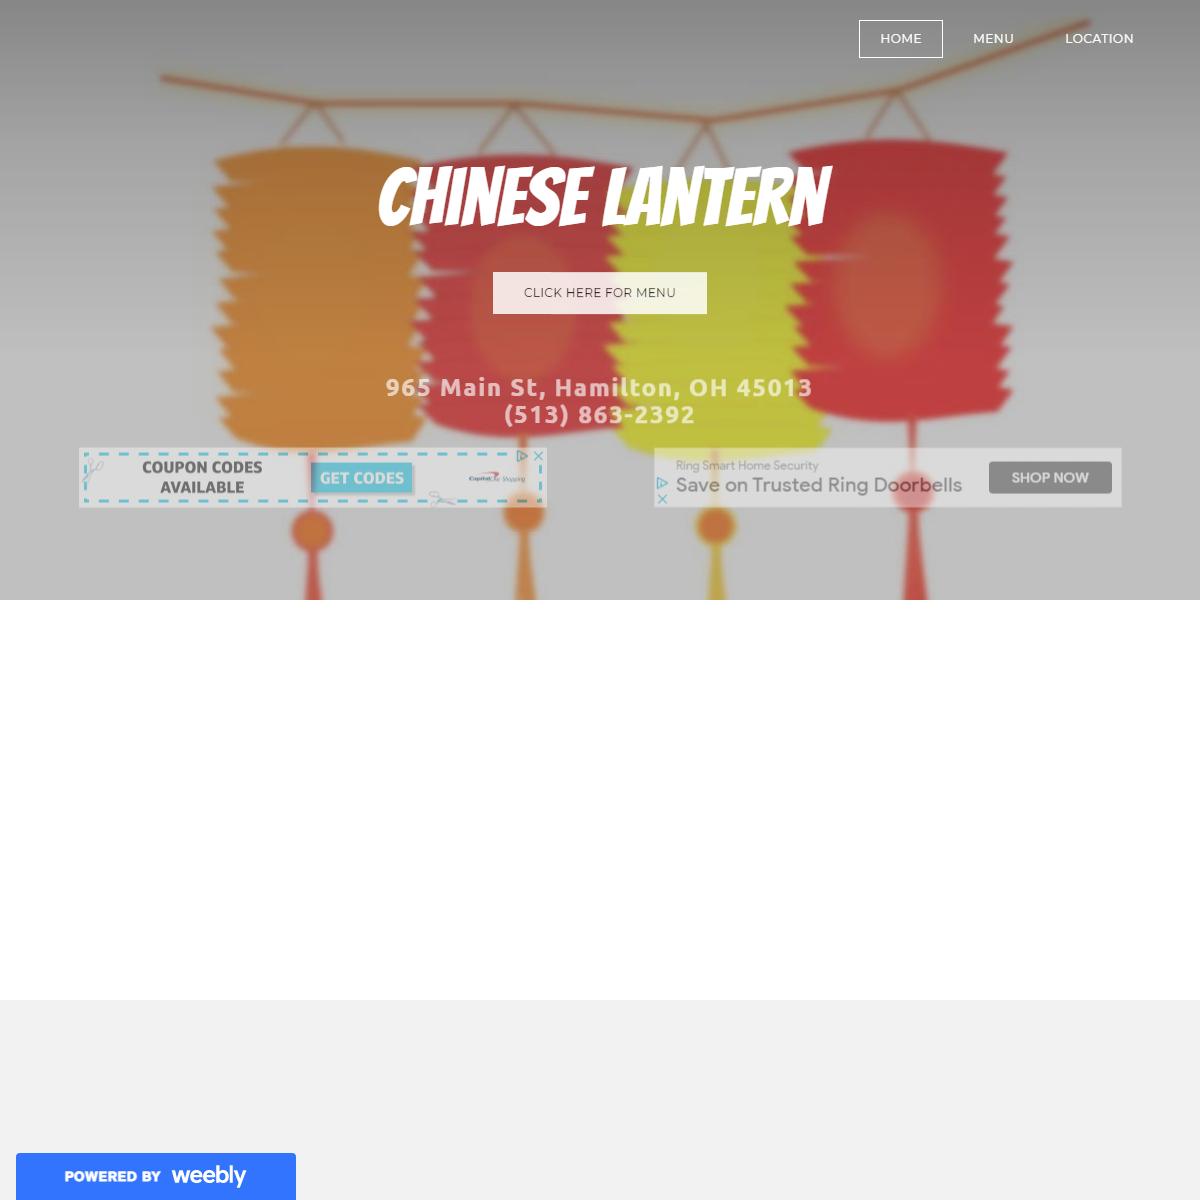 Chinese Lantern - Home